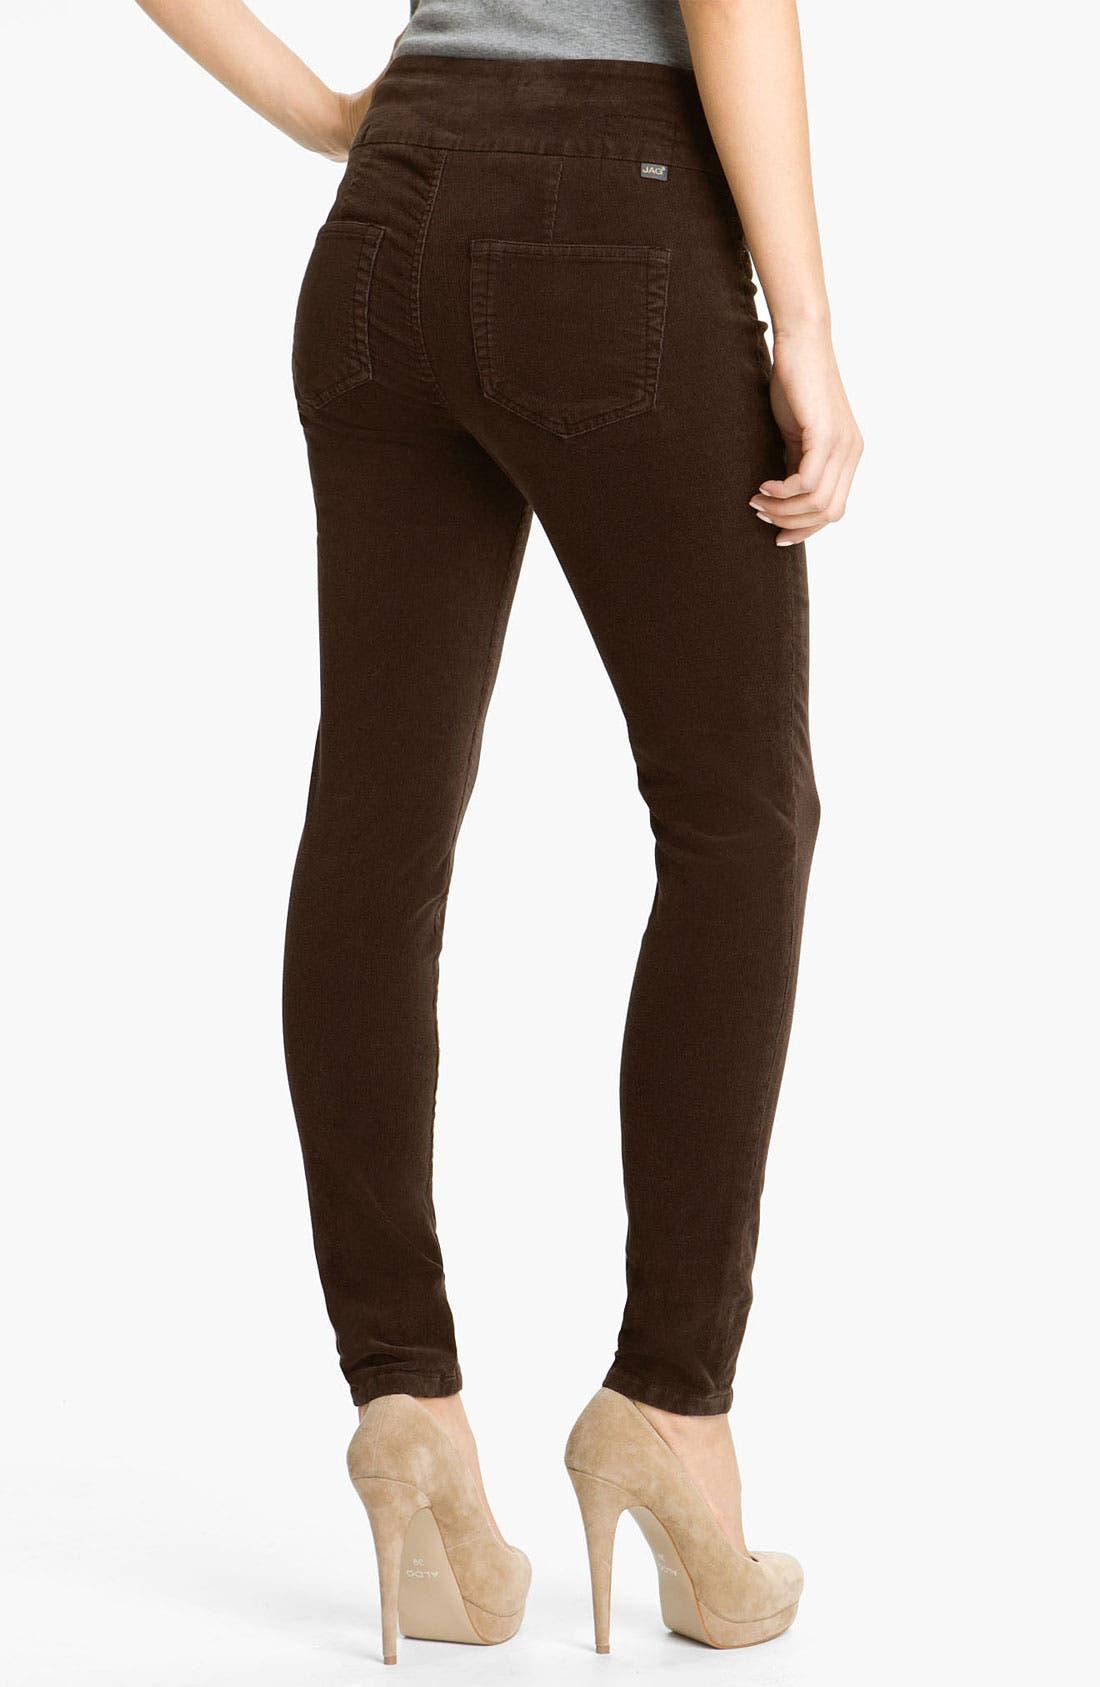 Alternate Image 1 Selected - Jag Jeans 'Nikki' Corduroy Leggings